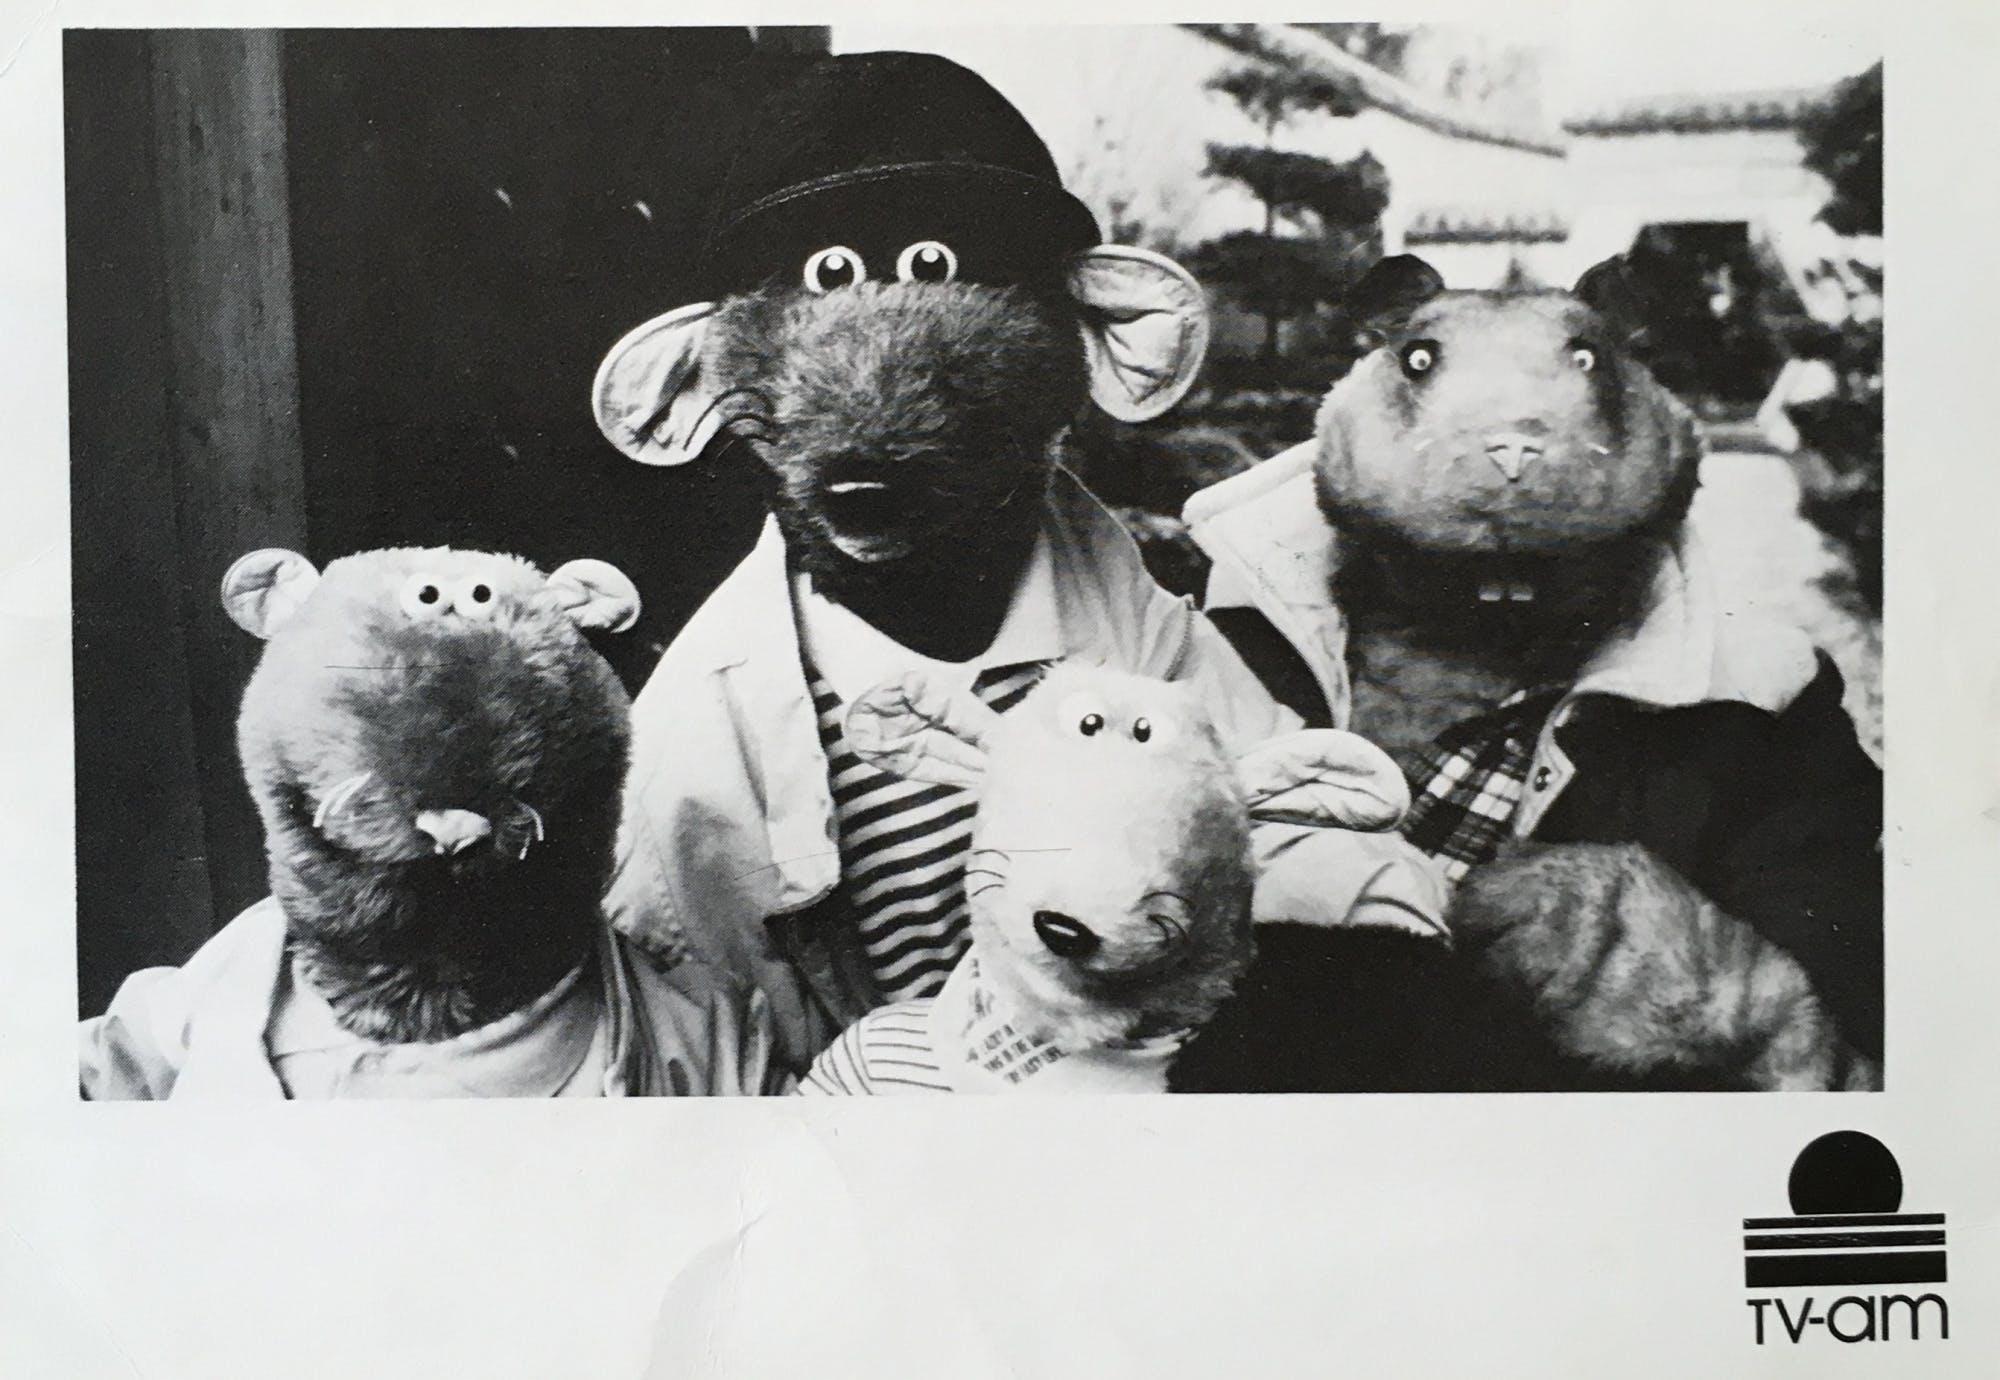 Roland Rat Goes East, TV-am